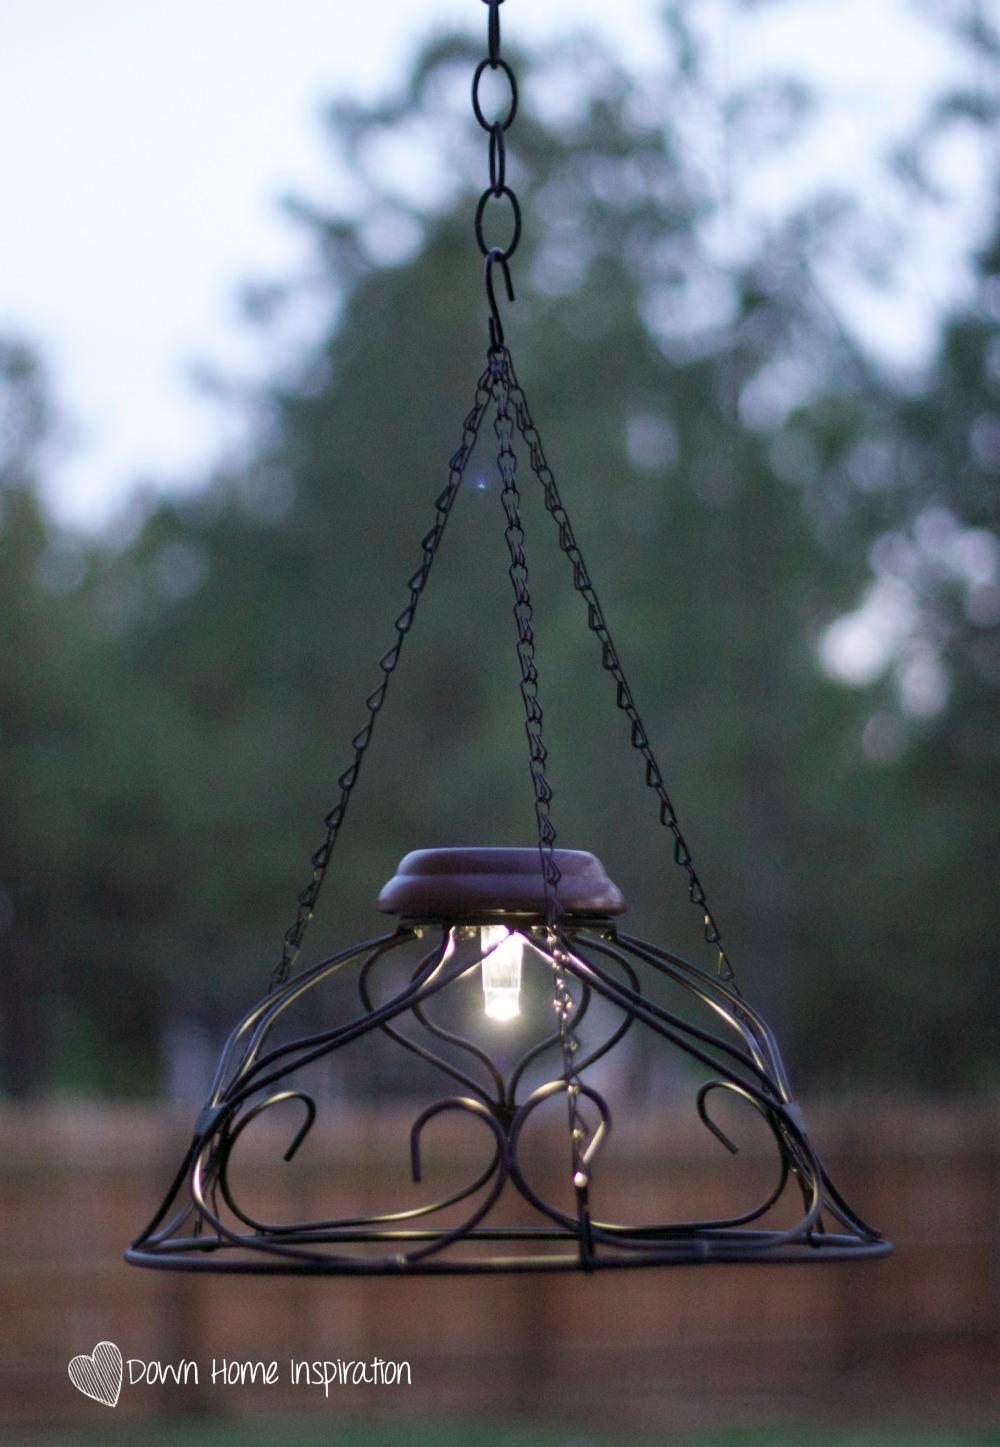 Solar chandelier 3 down home inspiration for Solar light chandelier diy